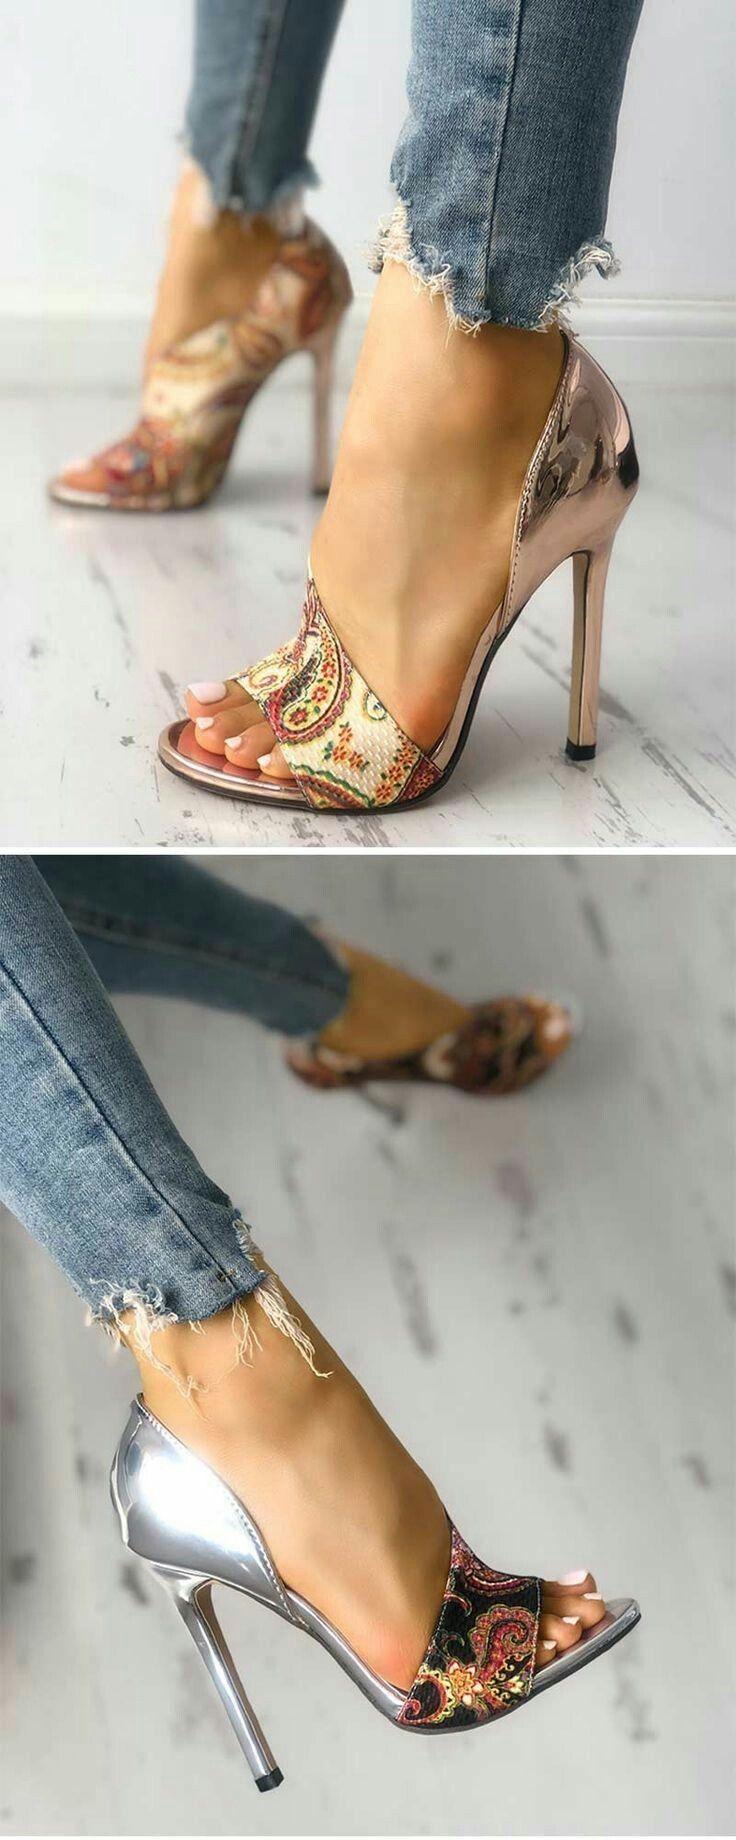 7b30cb015 Onde Comprar Sapatos Femininos Lindos e Baratos#sapatos #sapatosfemininos#sapatoslindos  #sapatofeminino#sandalha #sapatoalto #sandalhaalta#shoes # ...